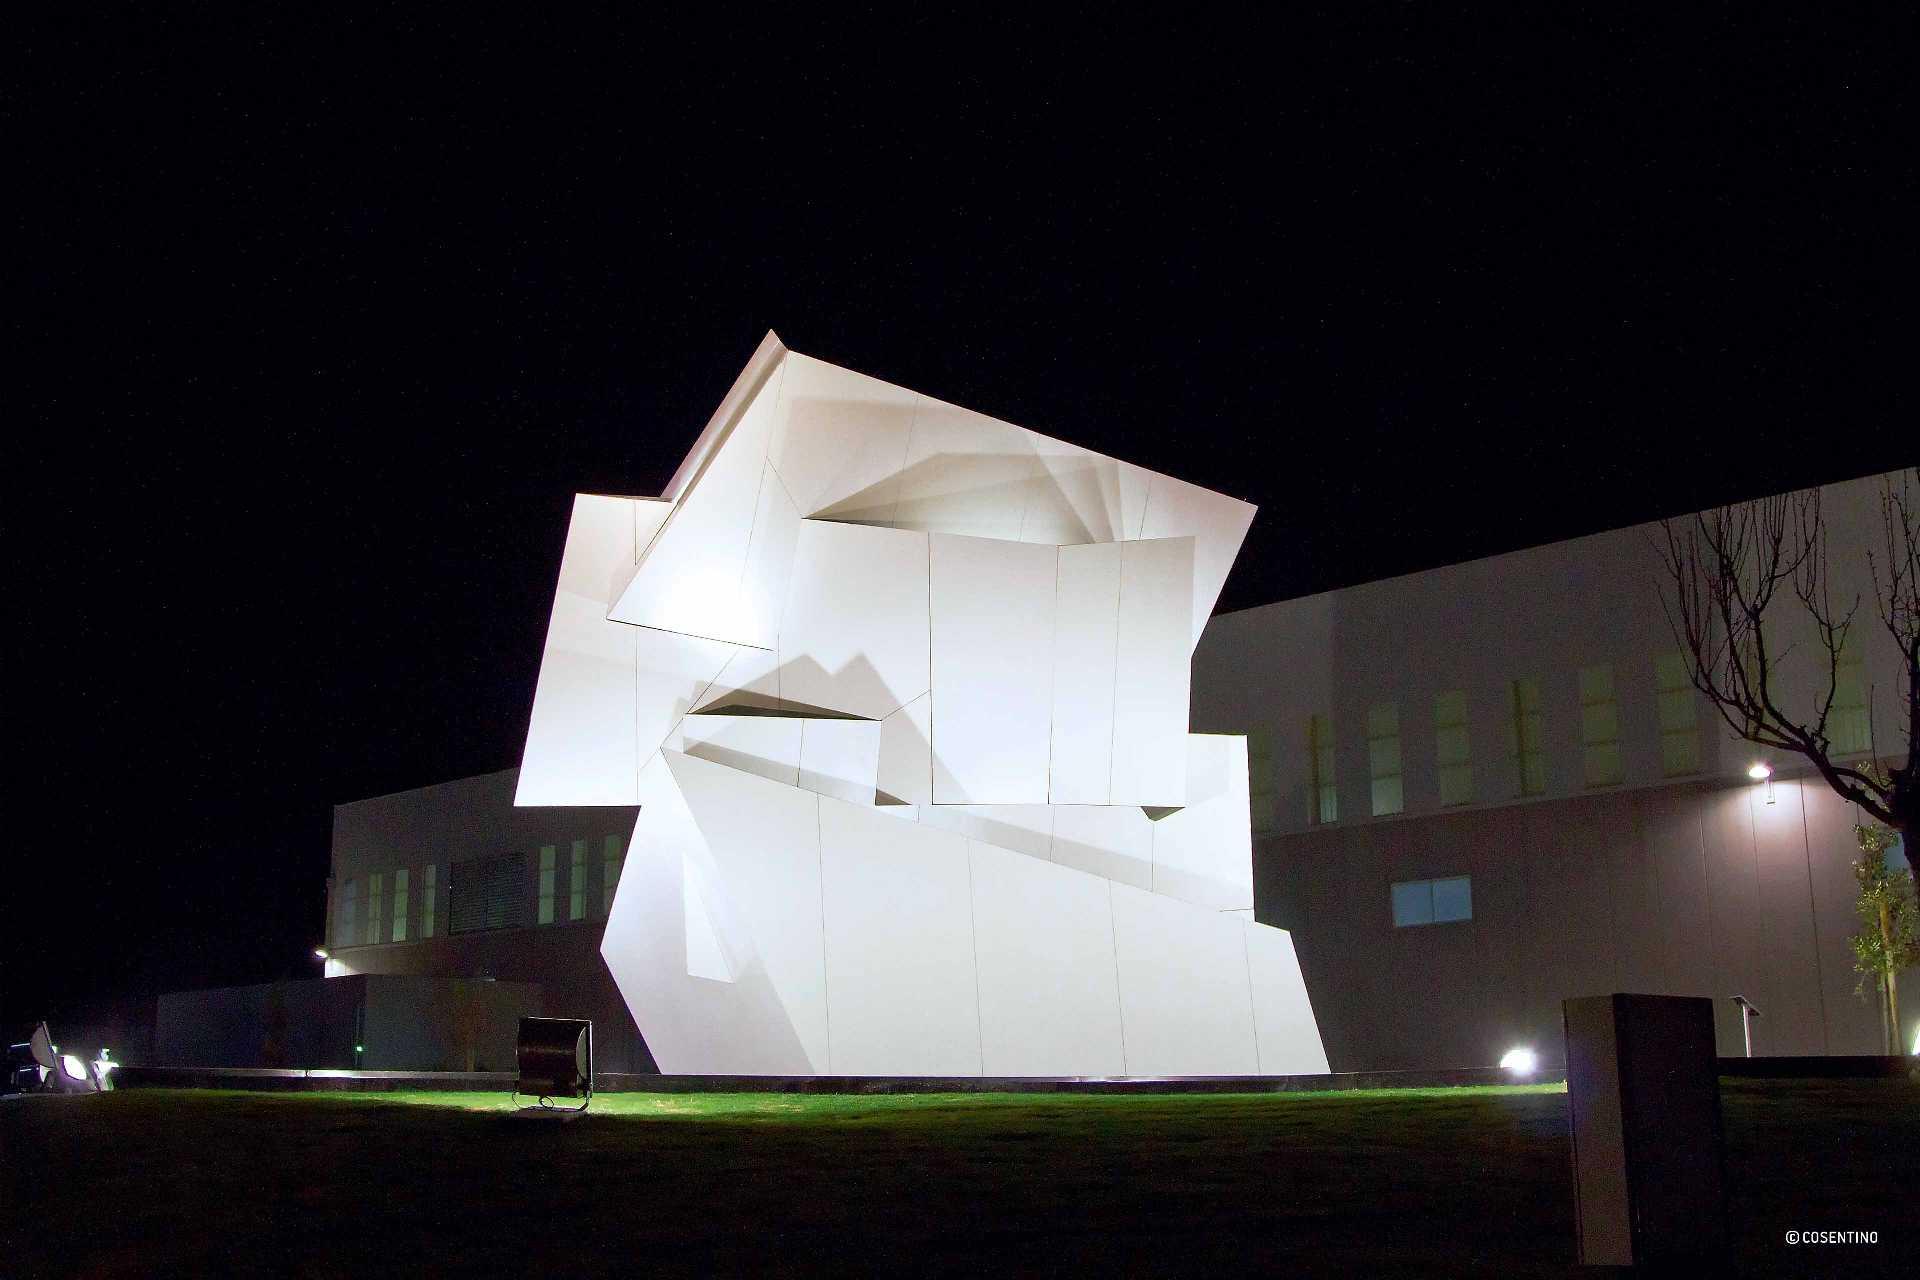 Daniel Libeskind's Sculptures  - LIBESKIND Nocturna 3 31